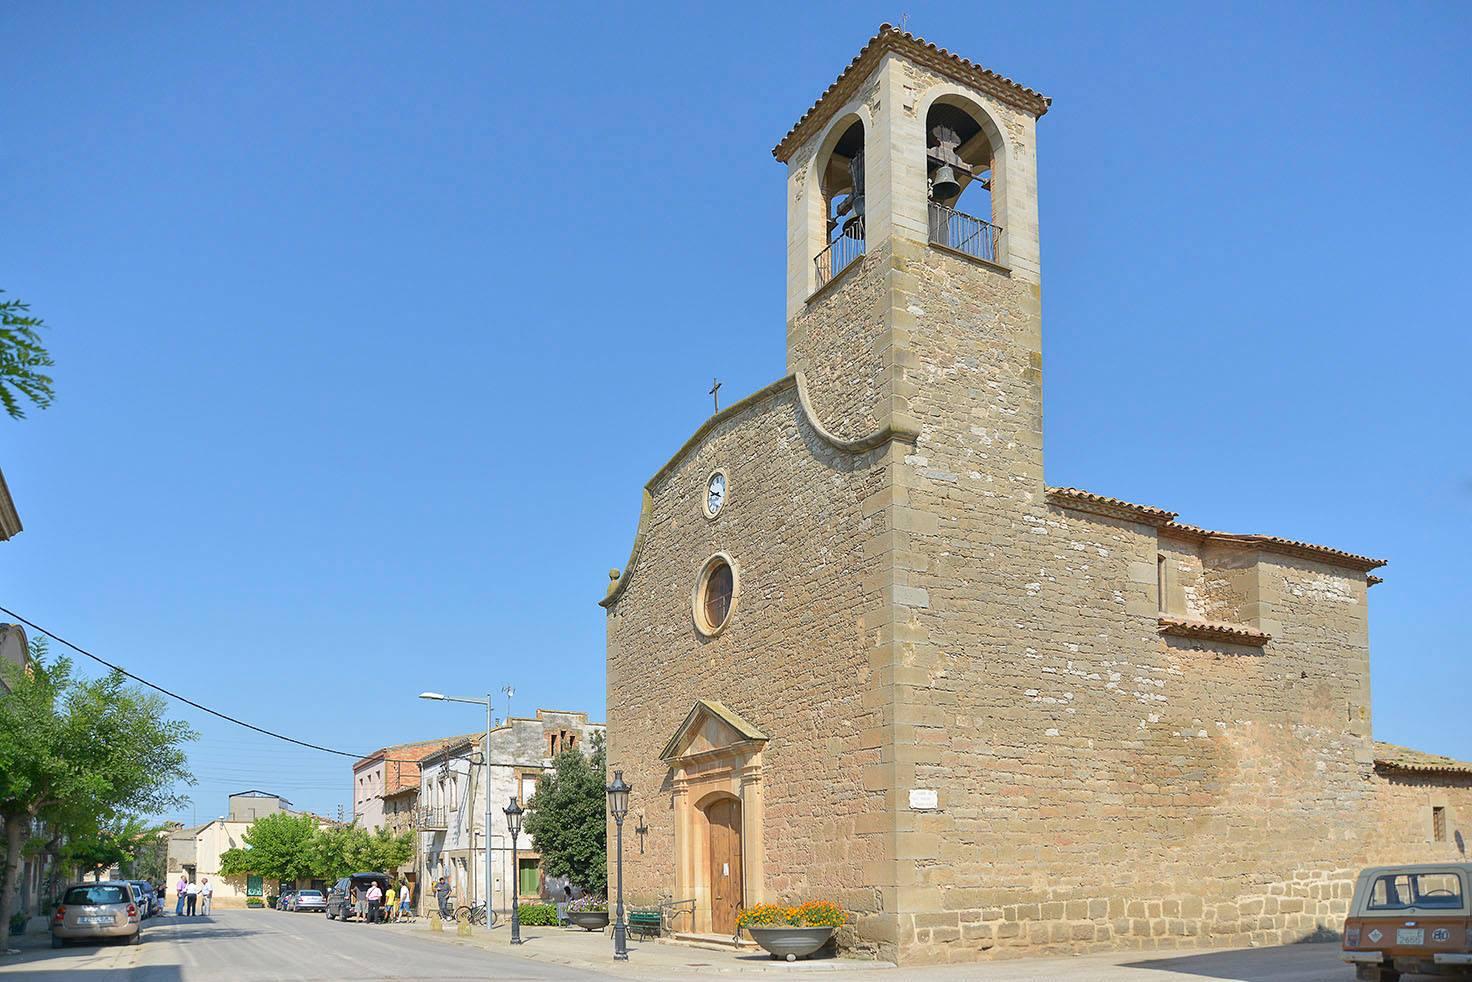 Esglèsia de Santa María de Montmagastrell